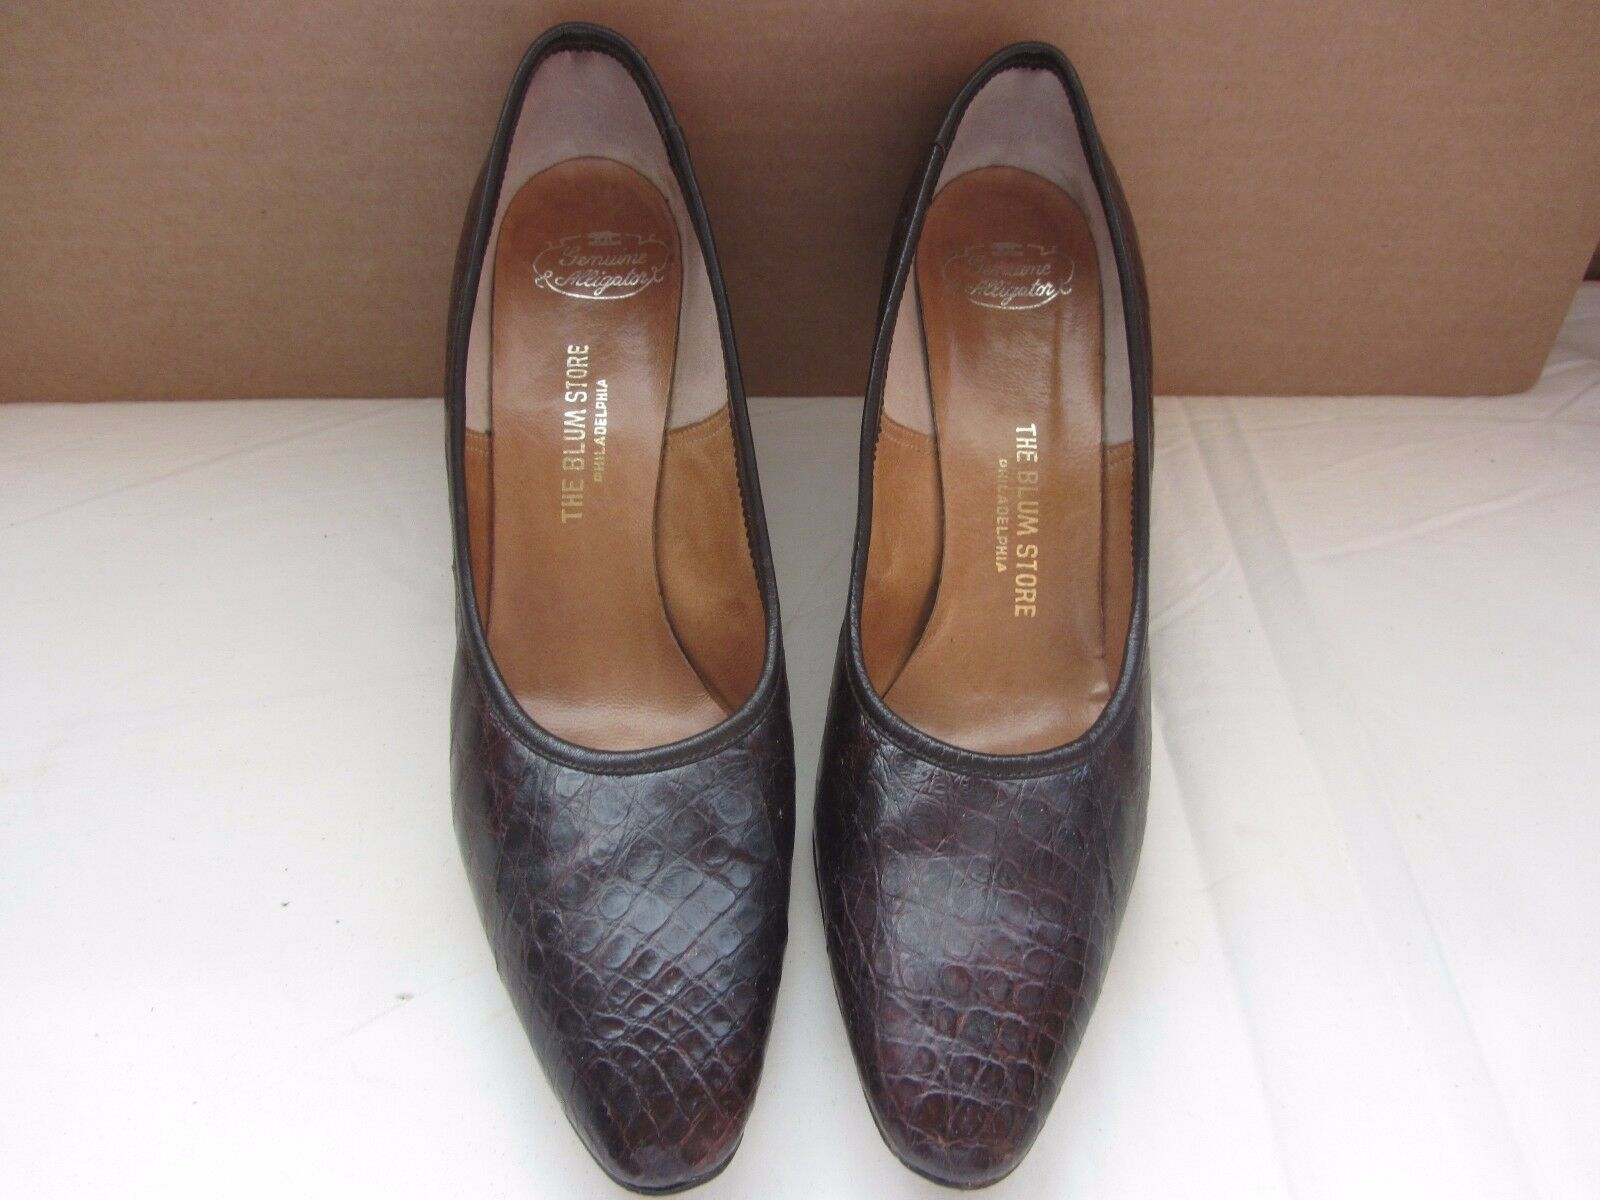 THE blueM STORE PHILADELPHIA genuine alligator womens shoes 8.5 AAAA